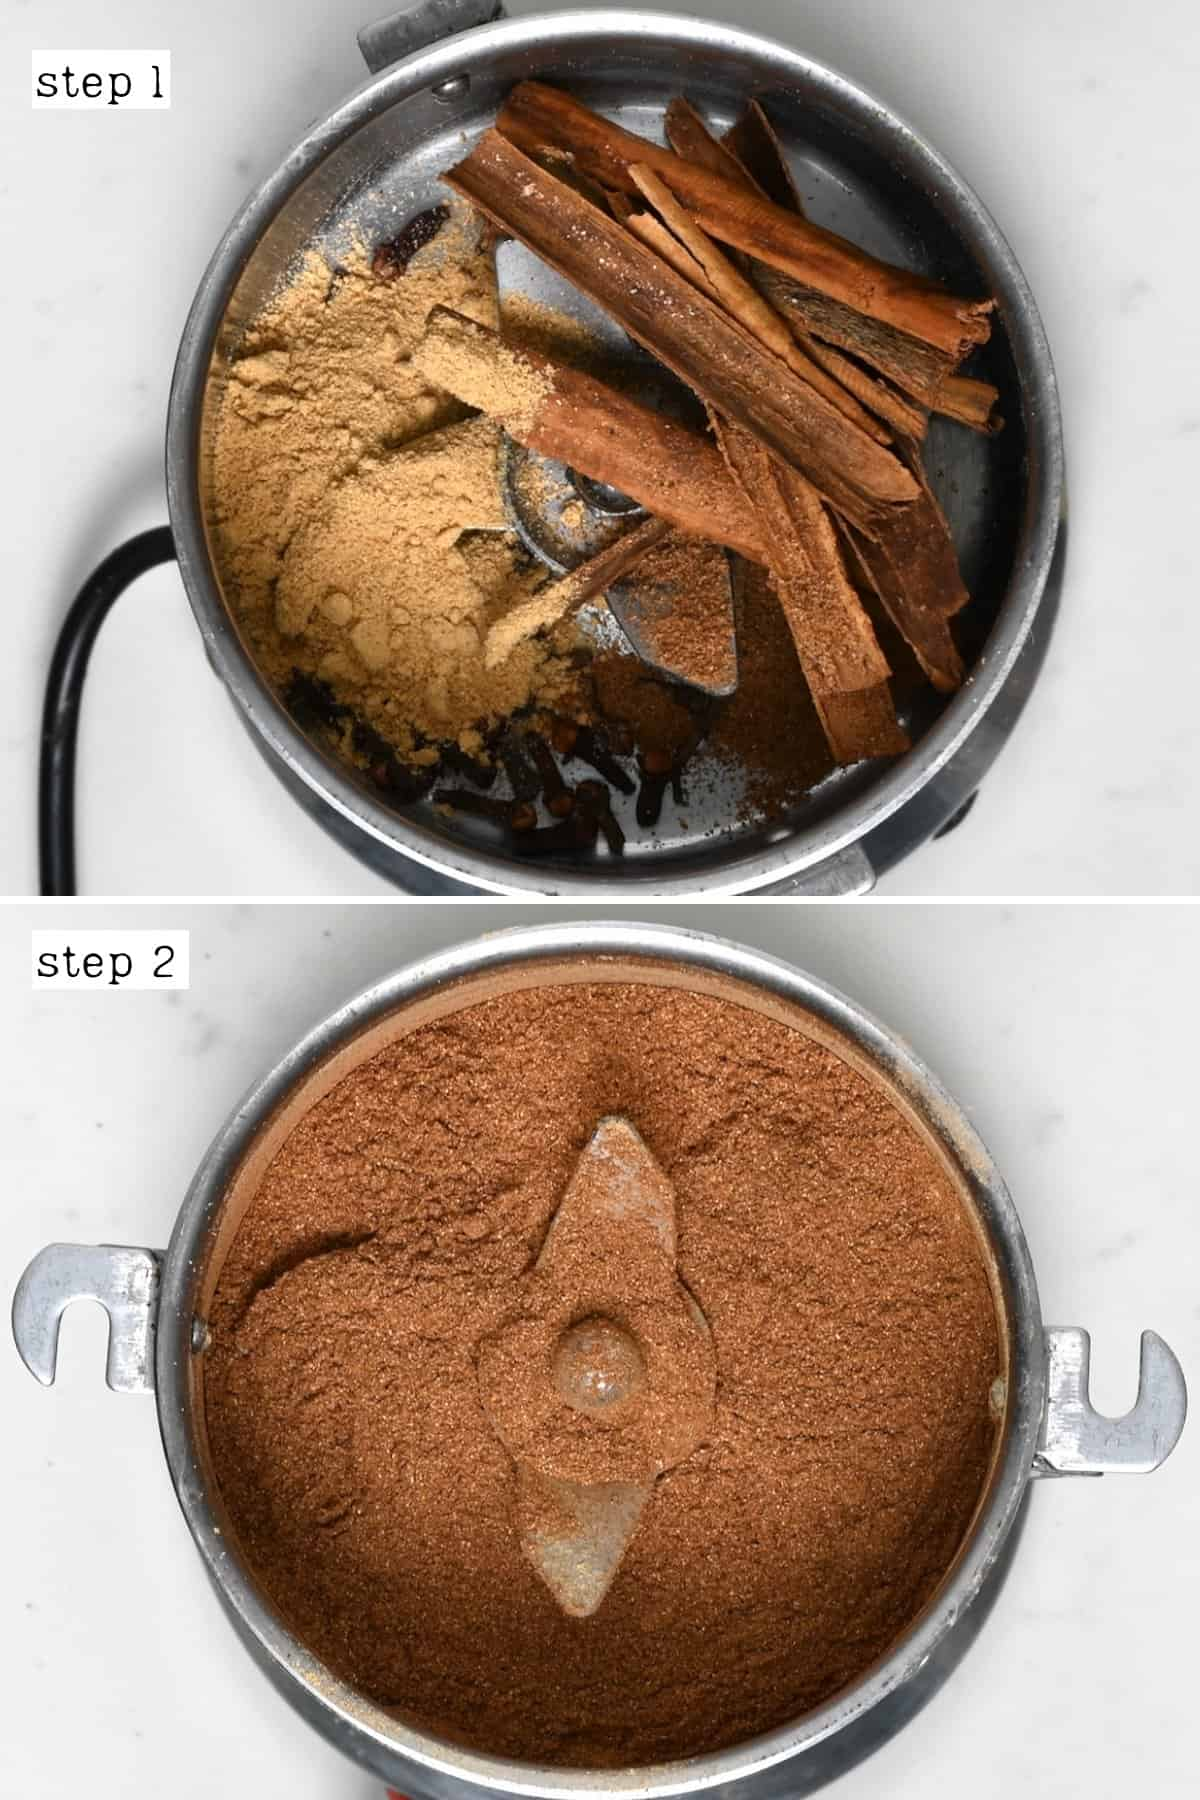 Steps for making pumpkin spice mix